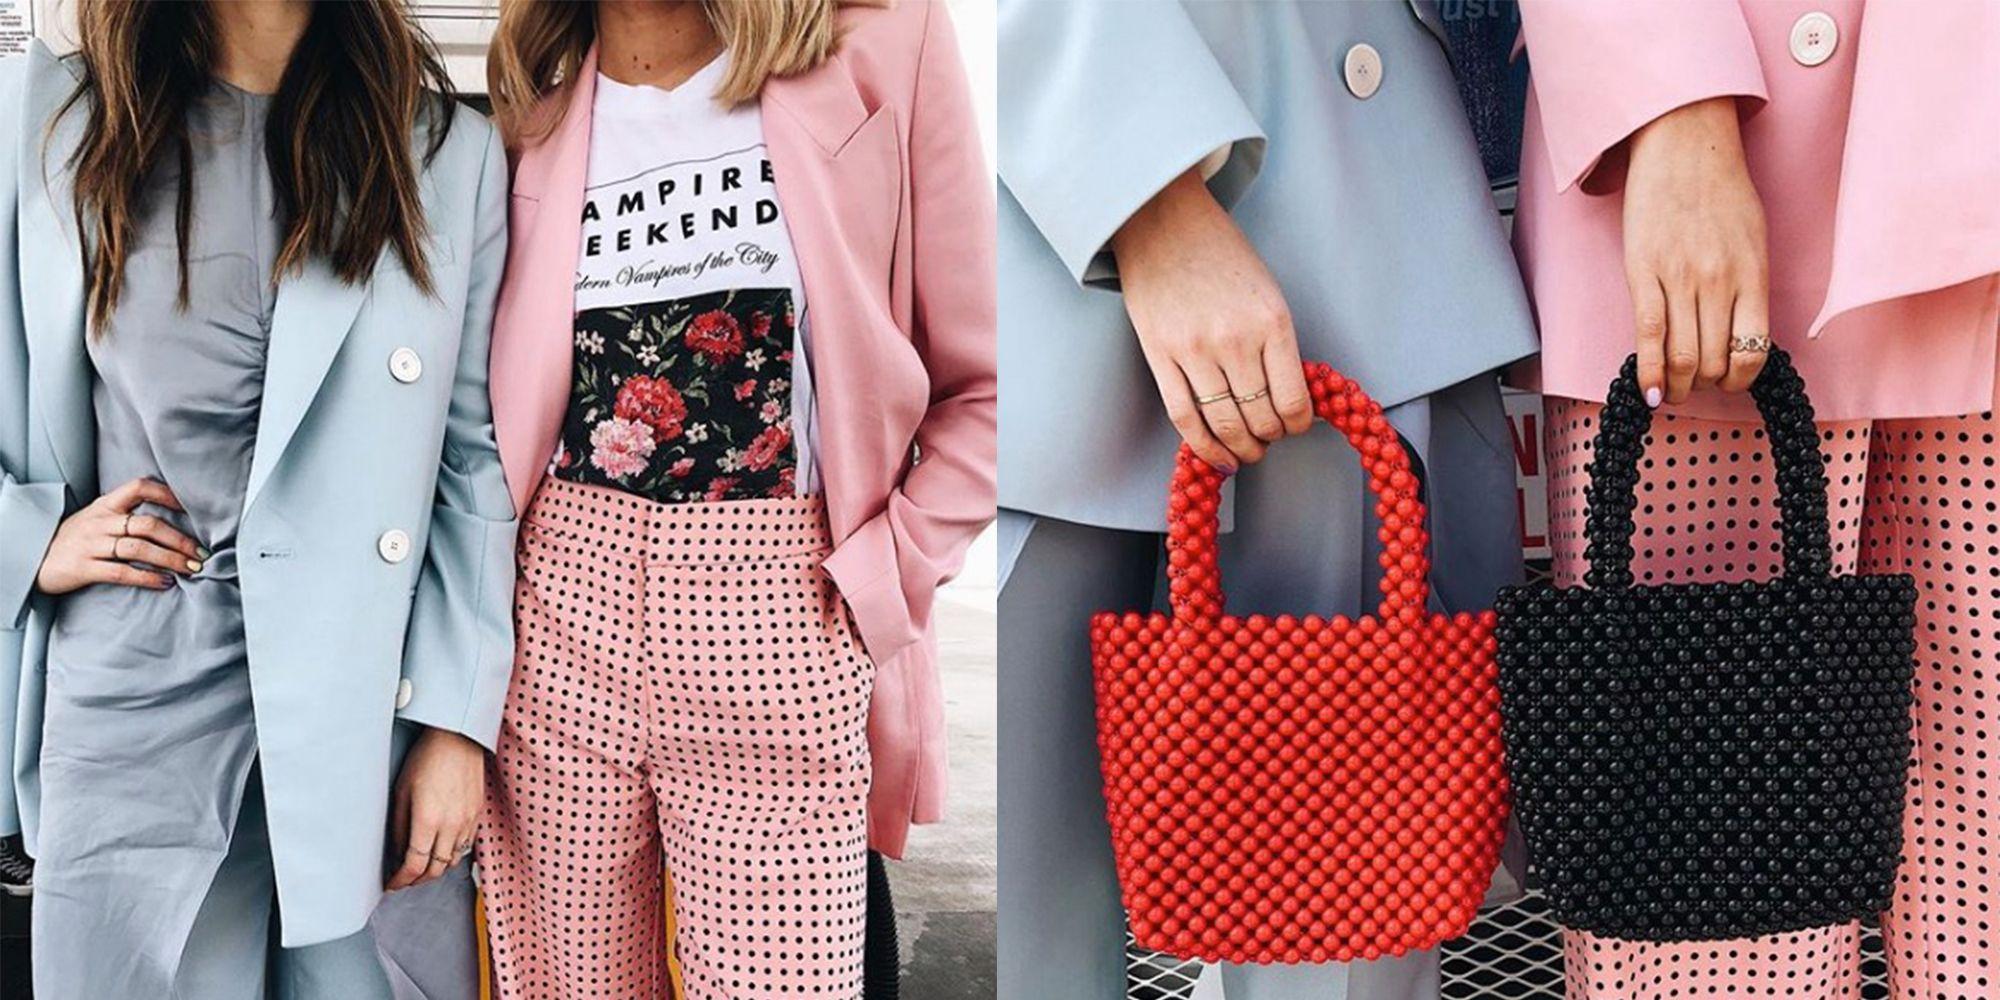 The Devils Wear Zara Instagram Account